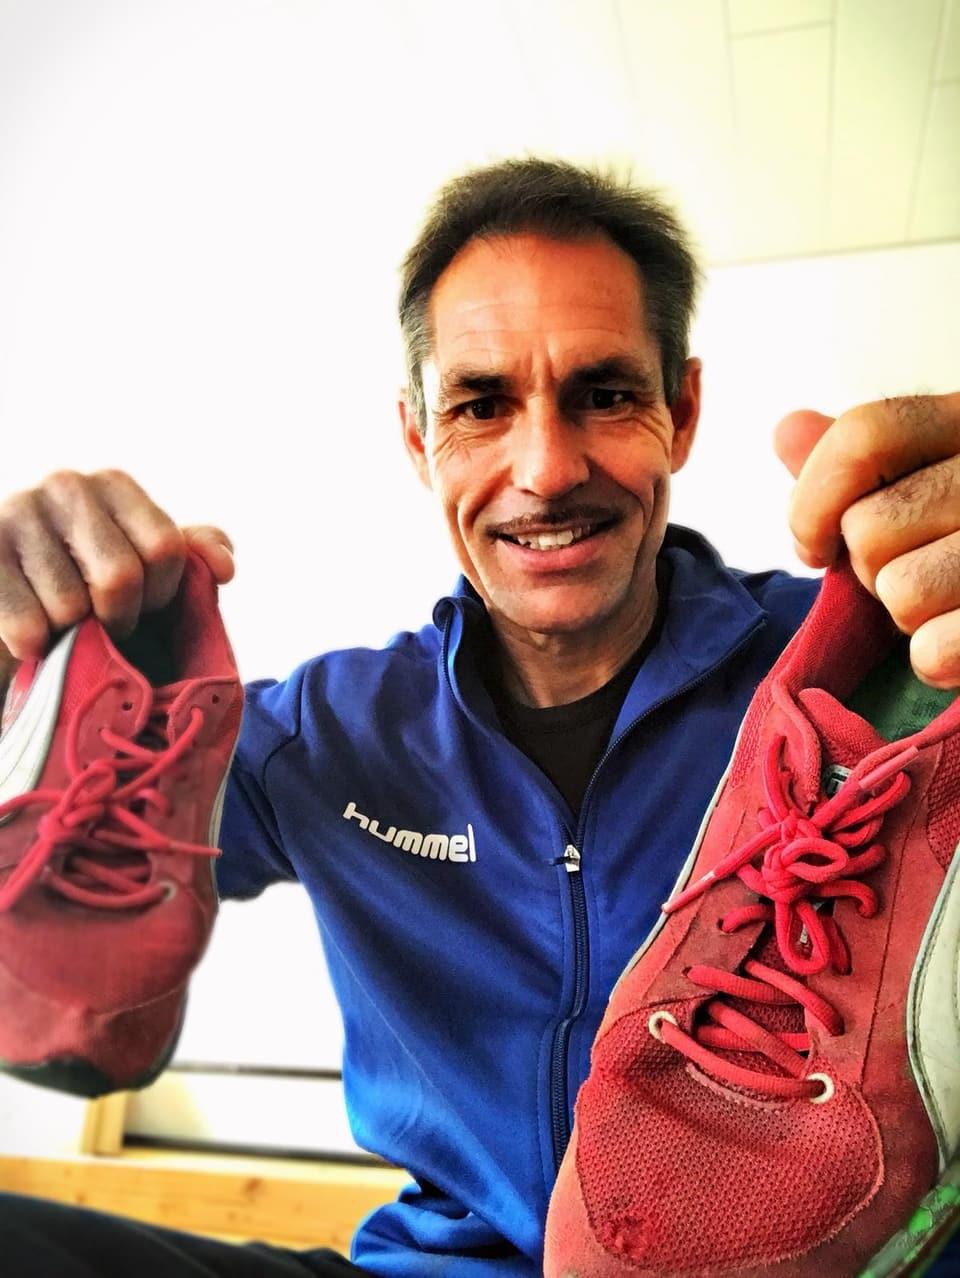 Freddy Nock mit roten Joggingschuhen